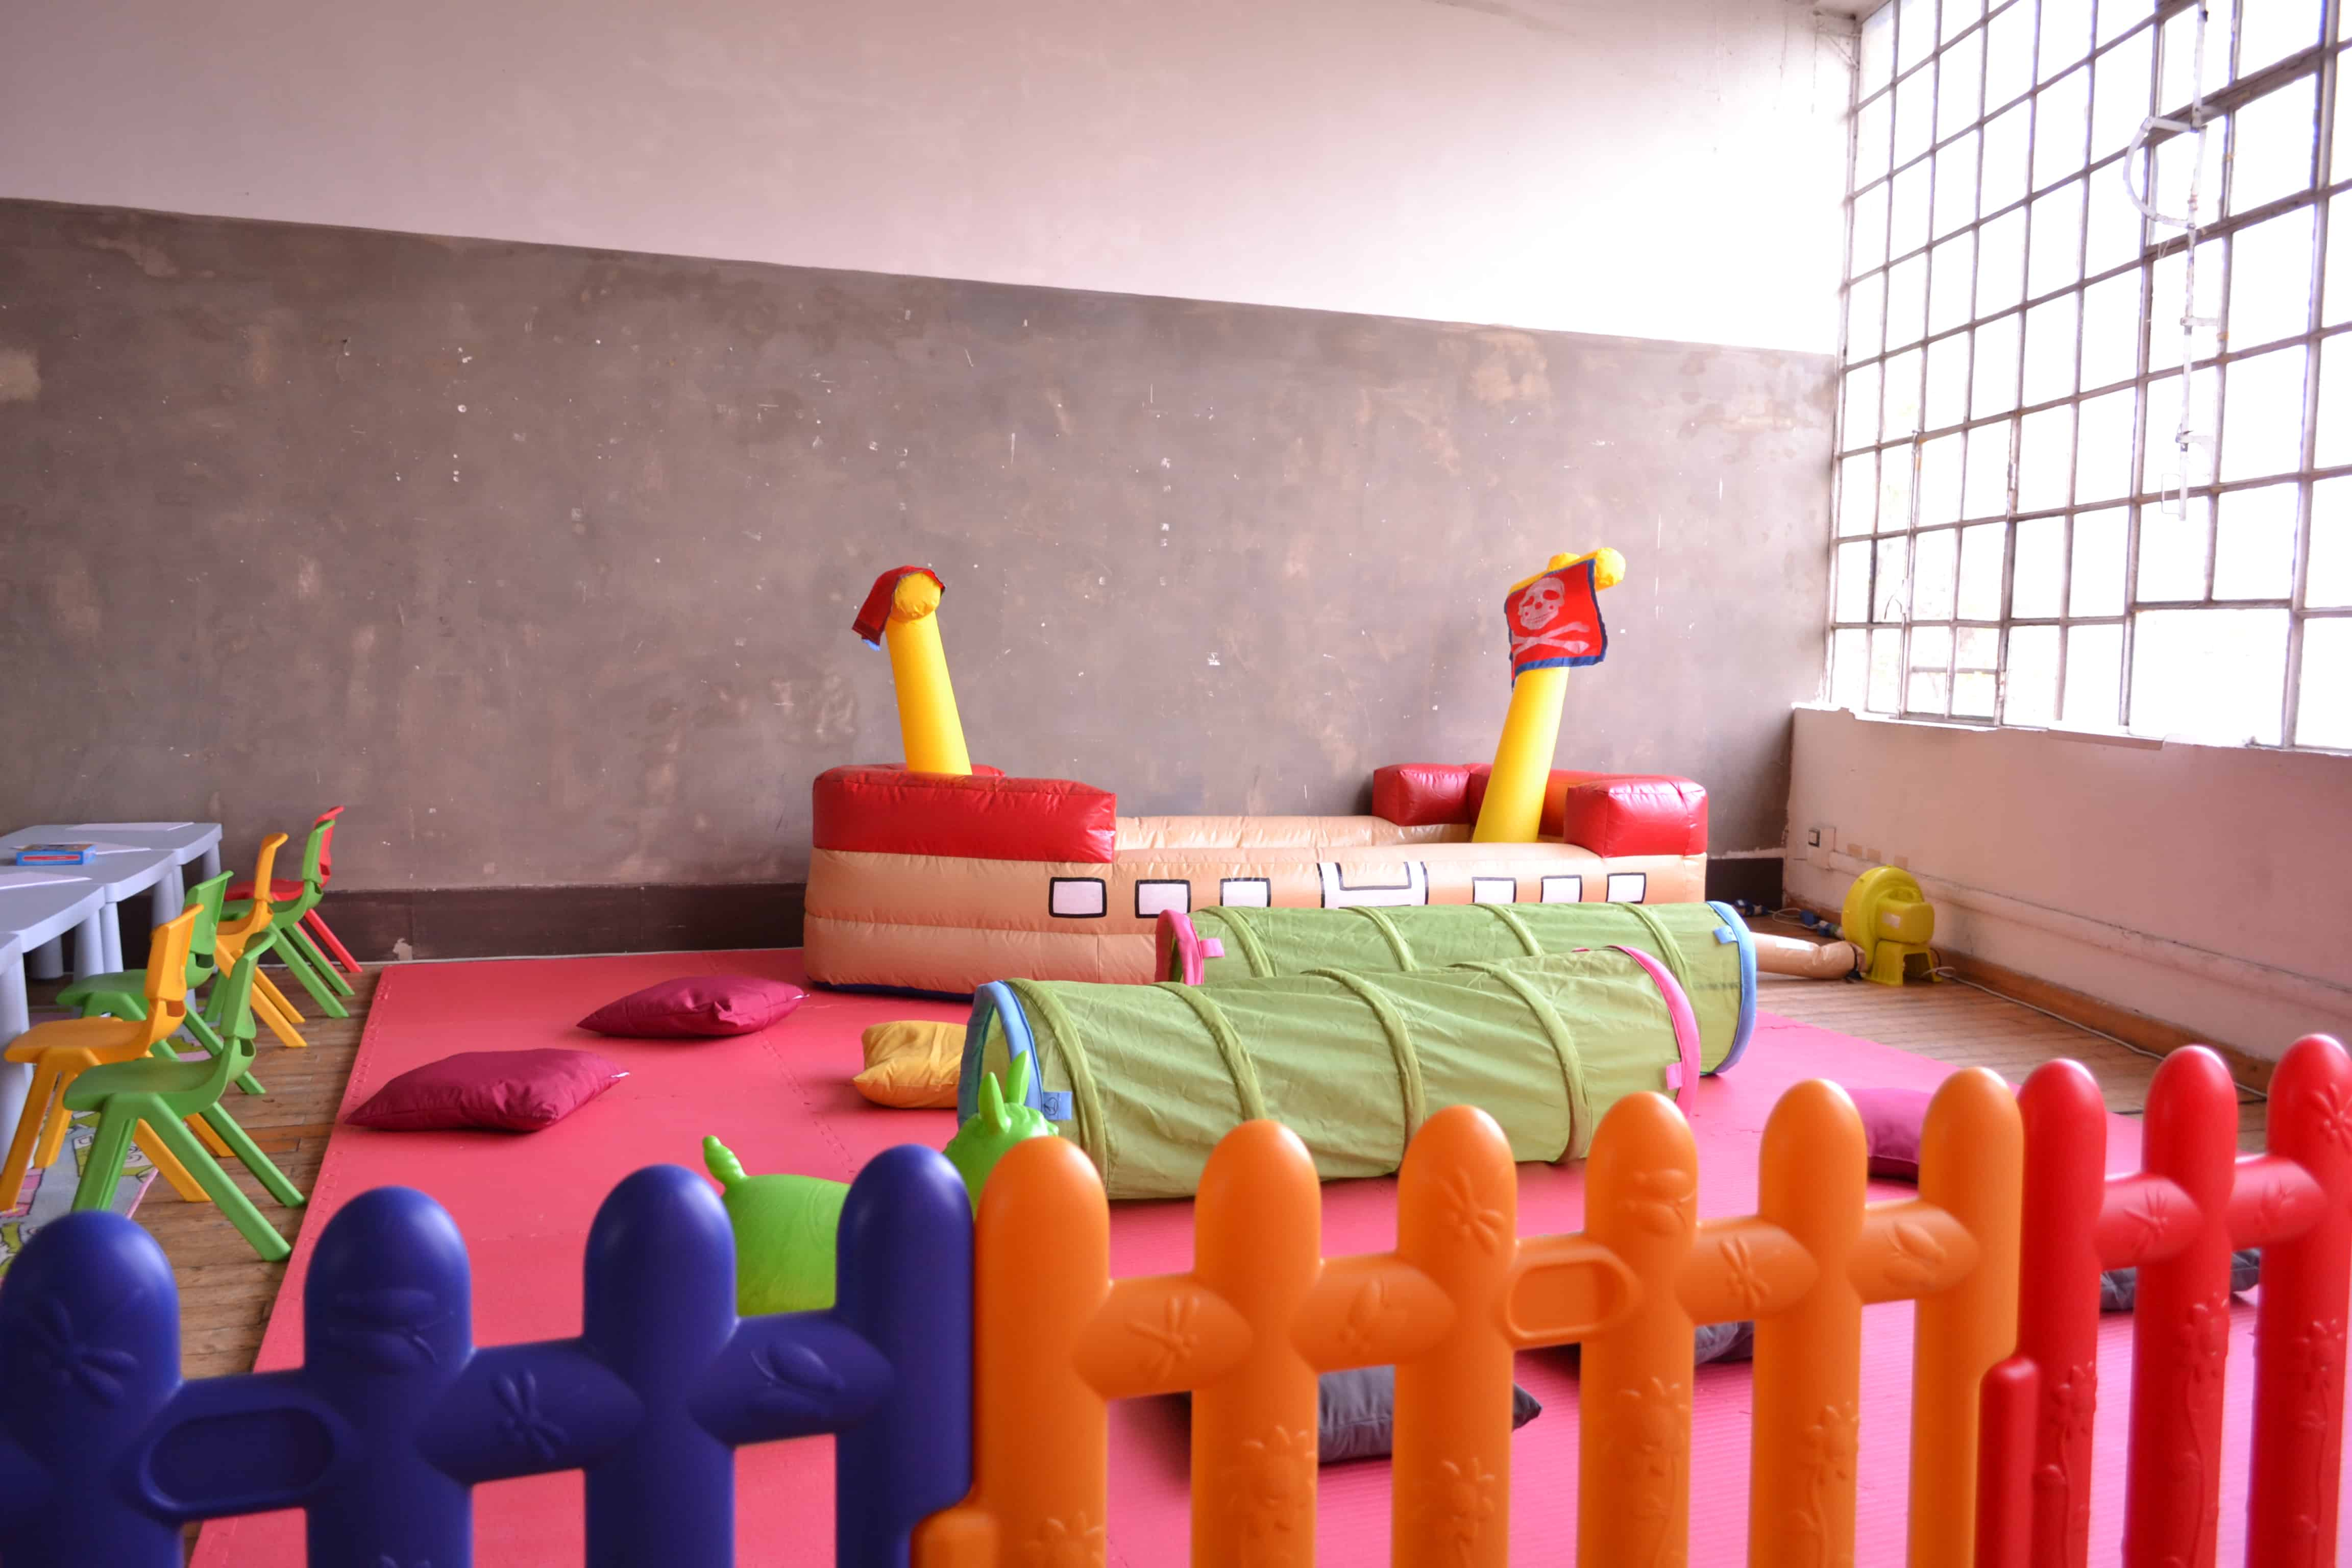 Noleggio attrezzature per feste a roma - Noleggio tavoli e sedie per feste catania ...